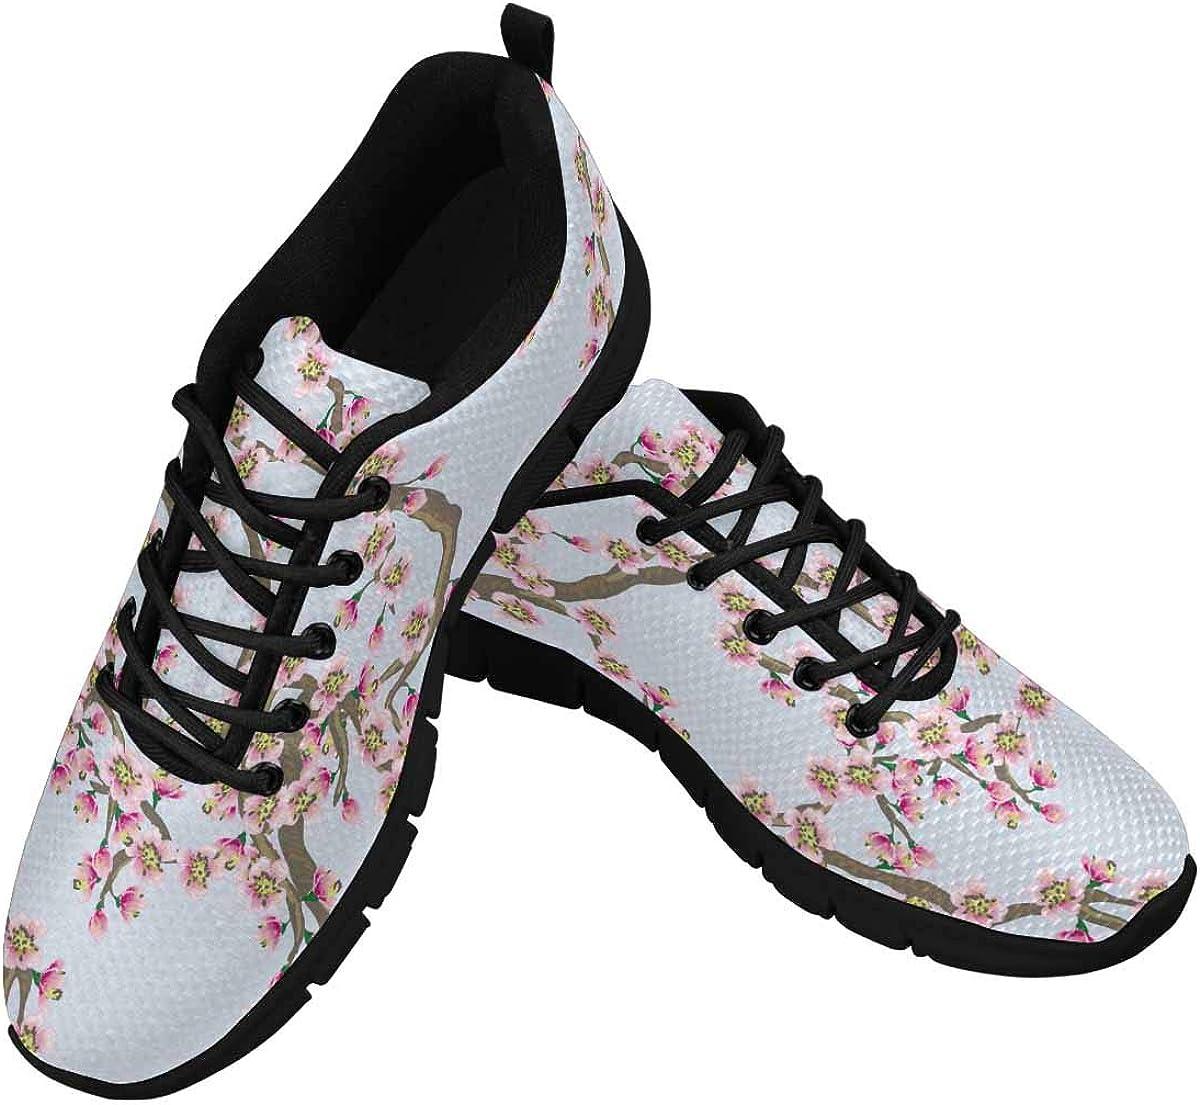 InterestPrint Pink Cherry Blossoms Popular overseas Women's Shoe Seasonal Wrap Introduction Branches Walking